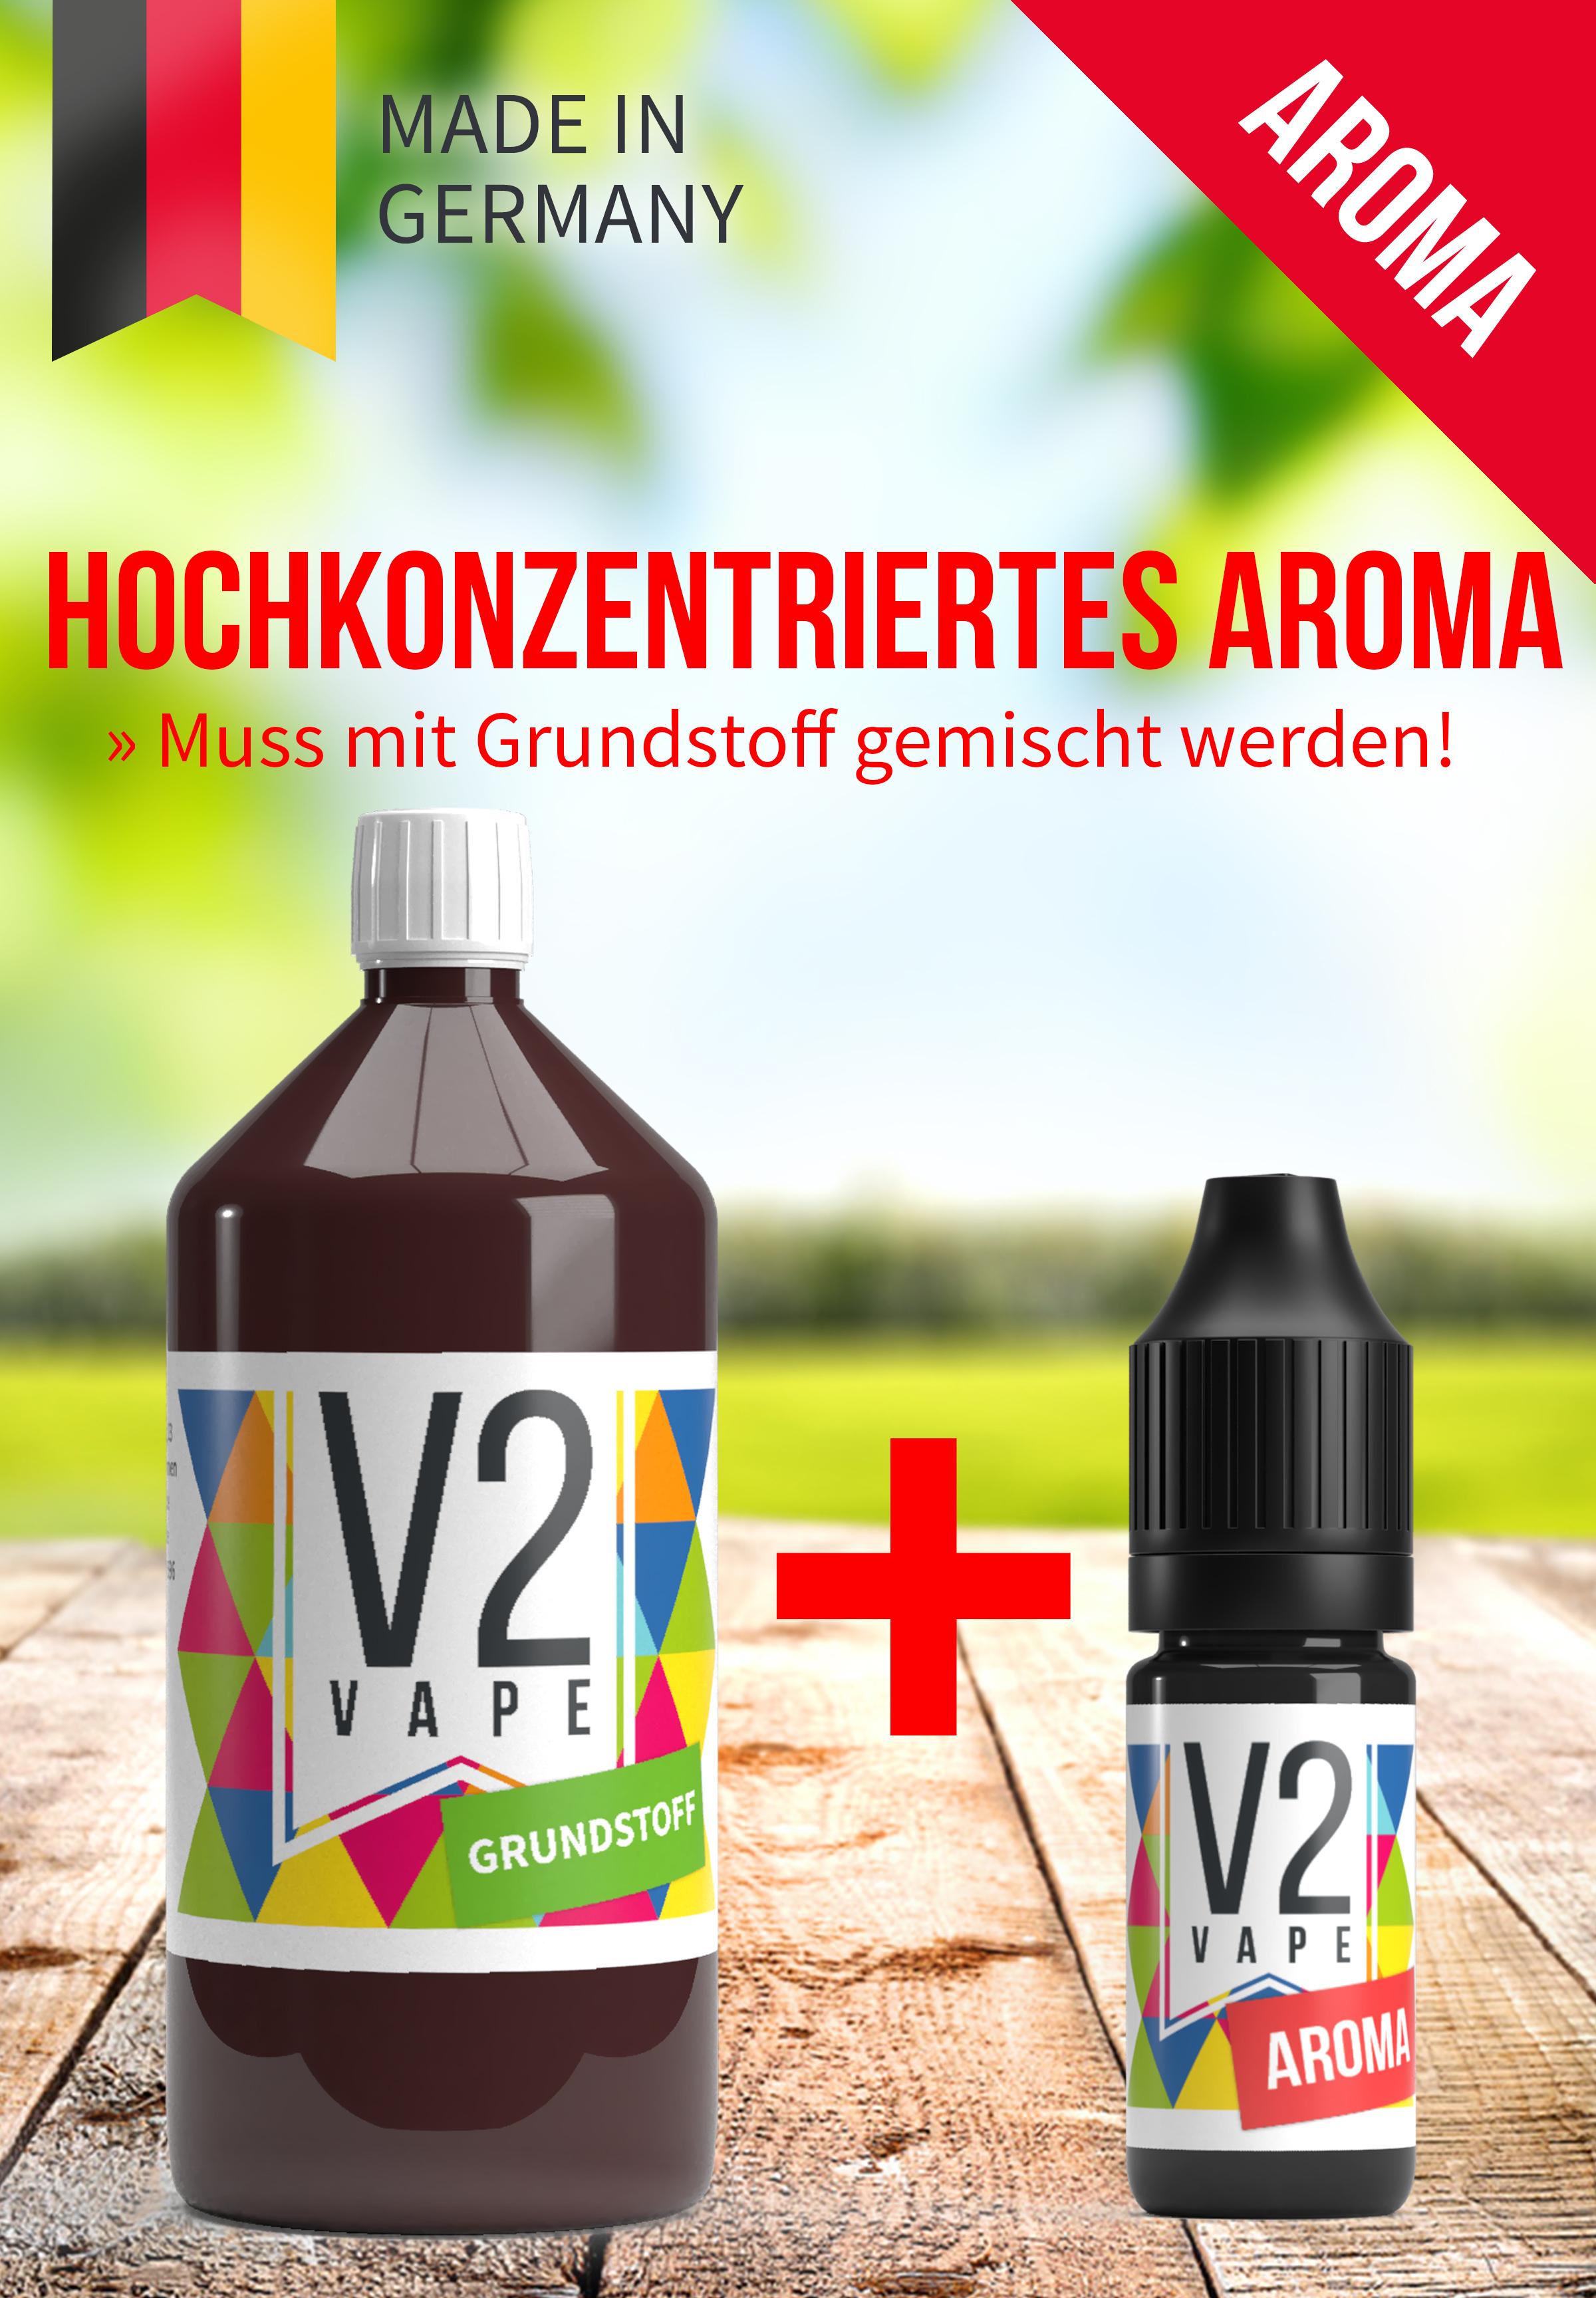 Konzentrat V2 Vape Drehtabak Halfzware Shag AROMA